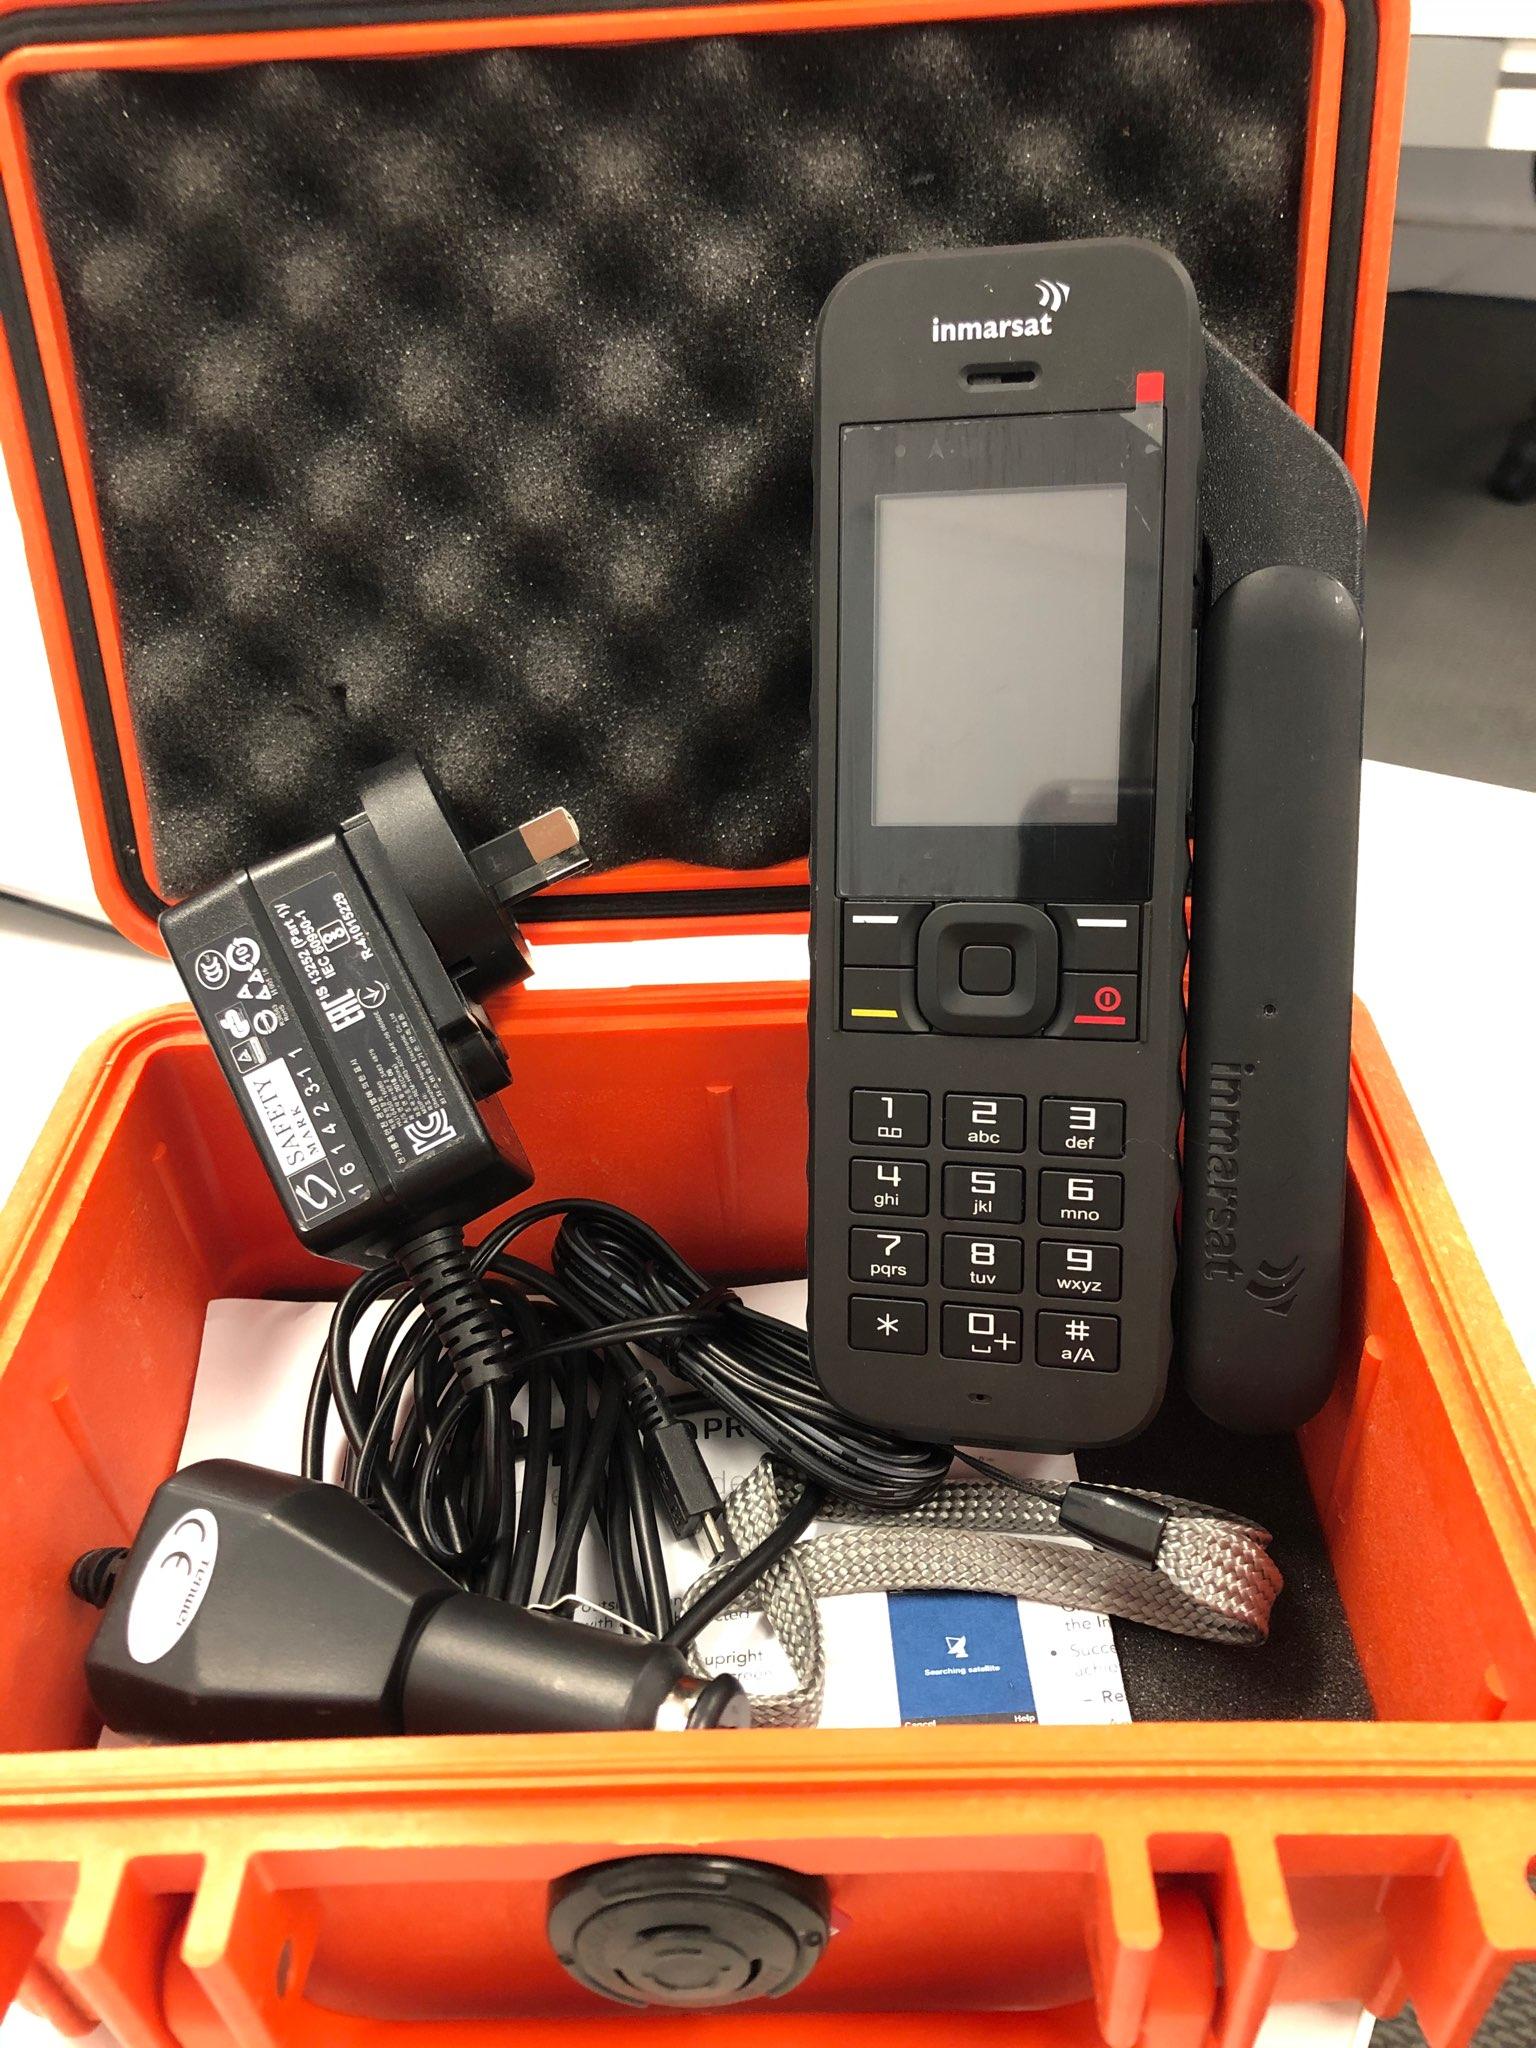 isat-2-rental-handset.jpg